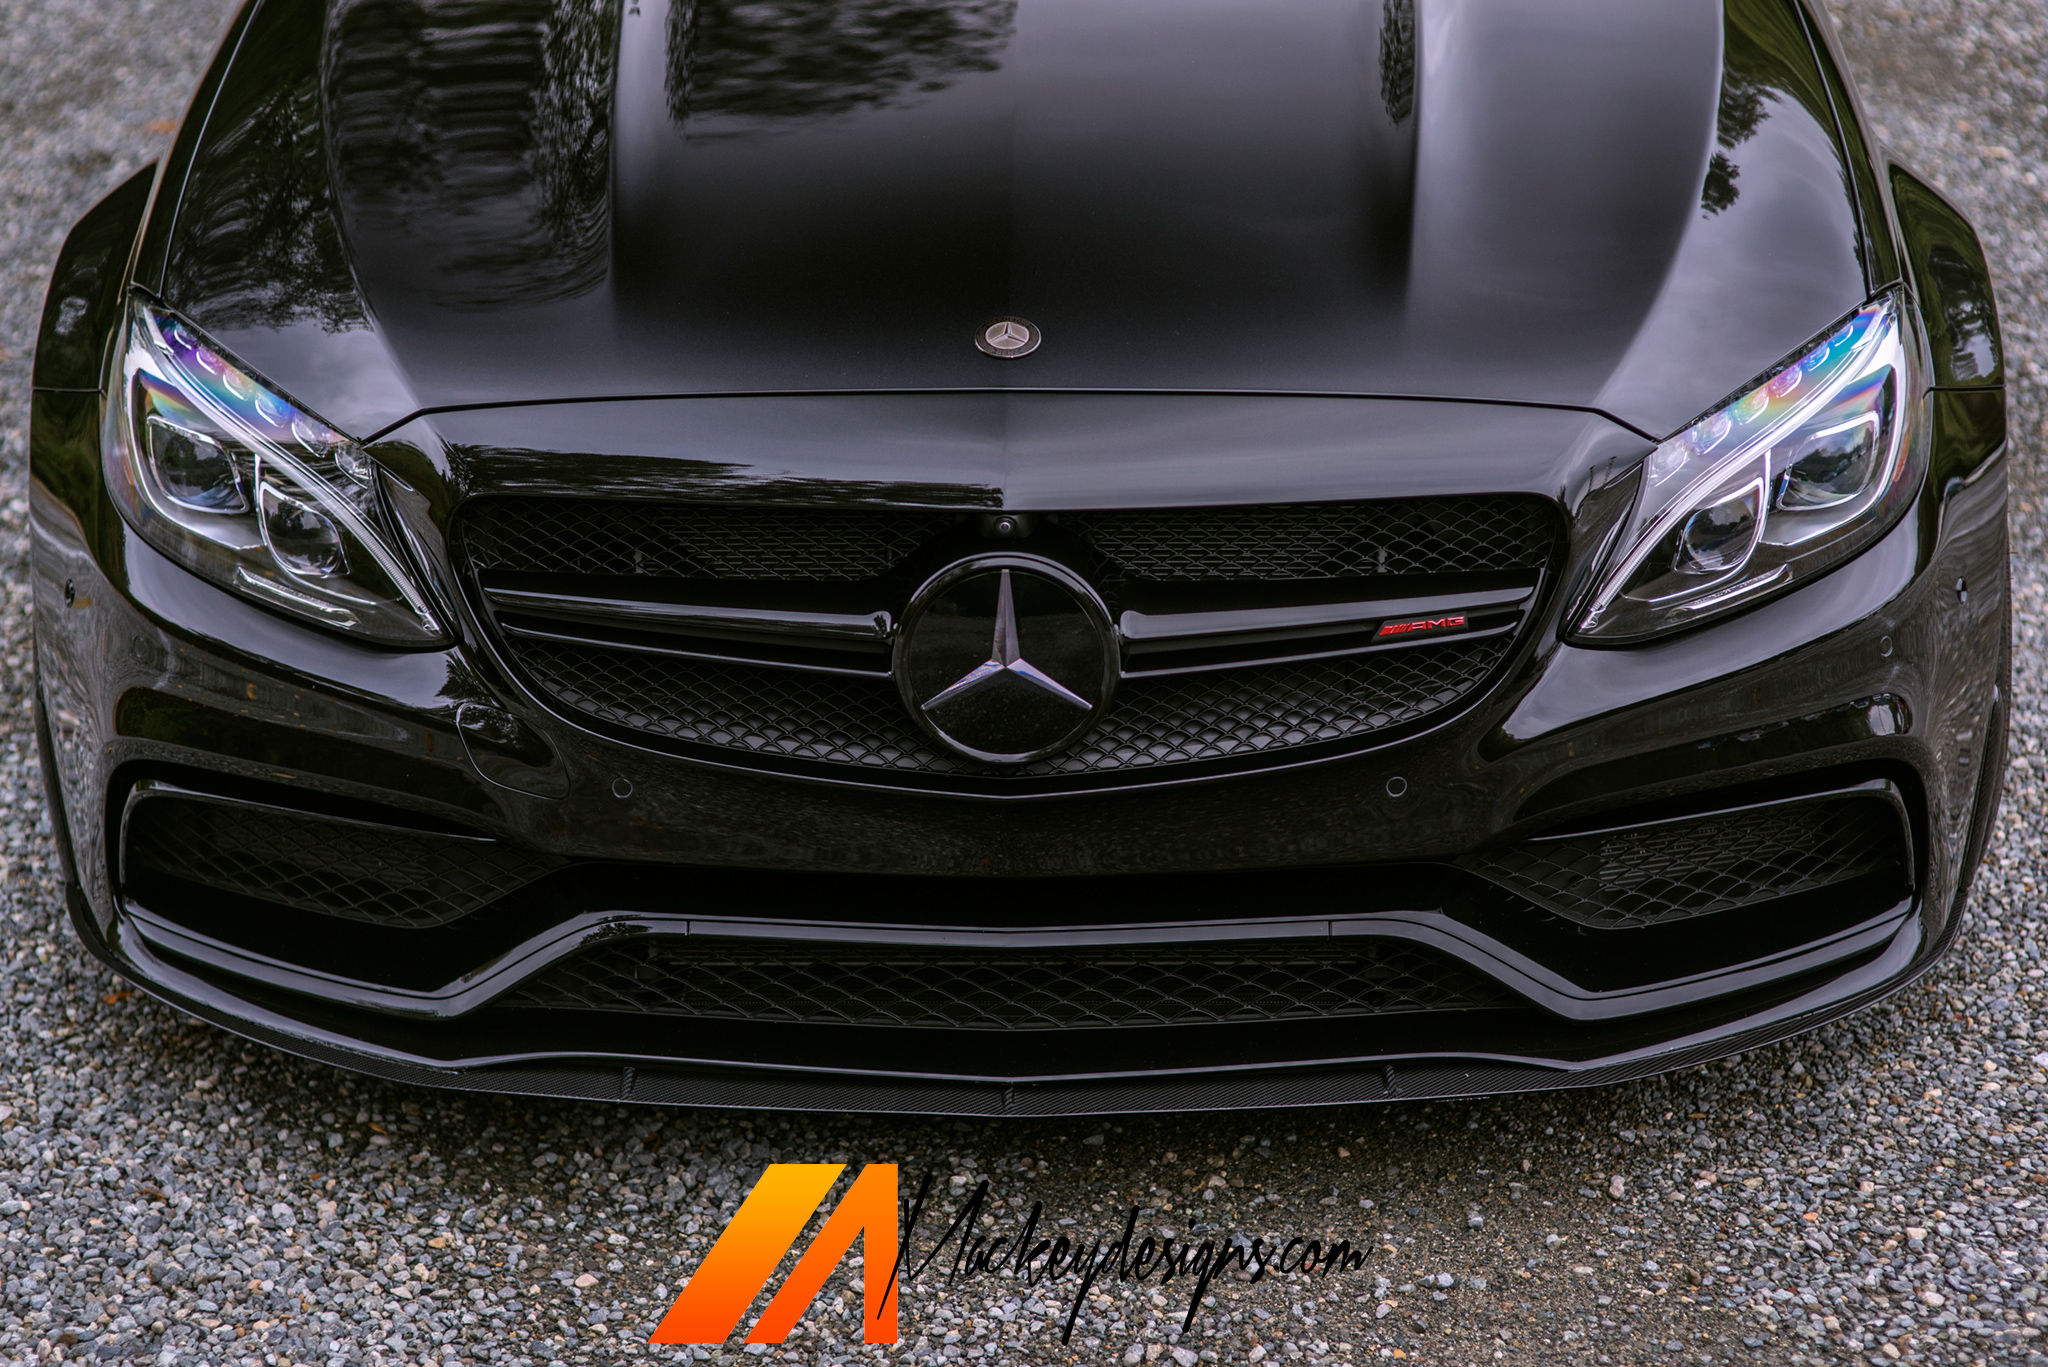 Mackeydesigns_Mercedes_C63S-12.jpg